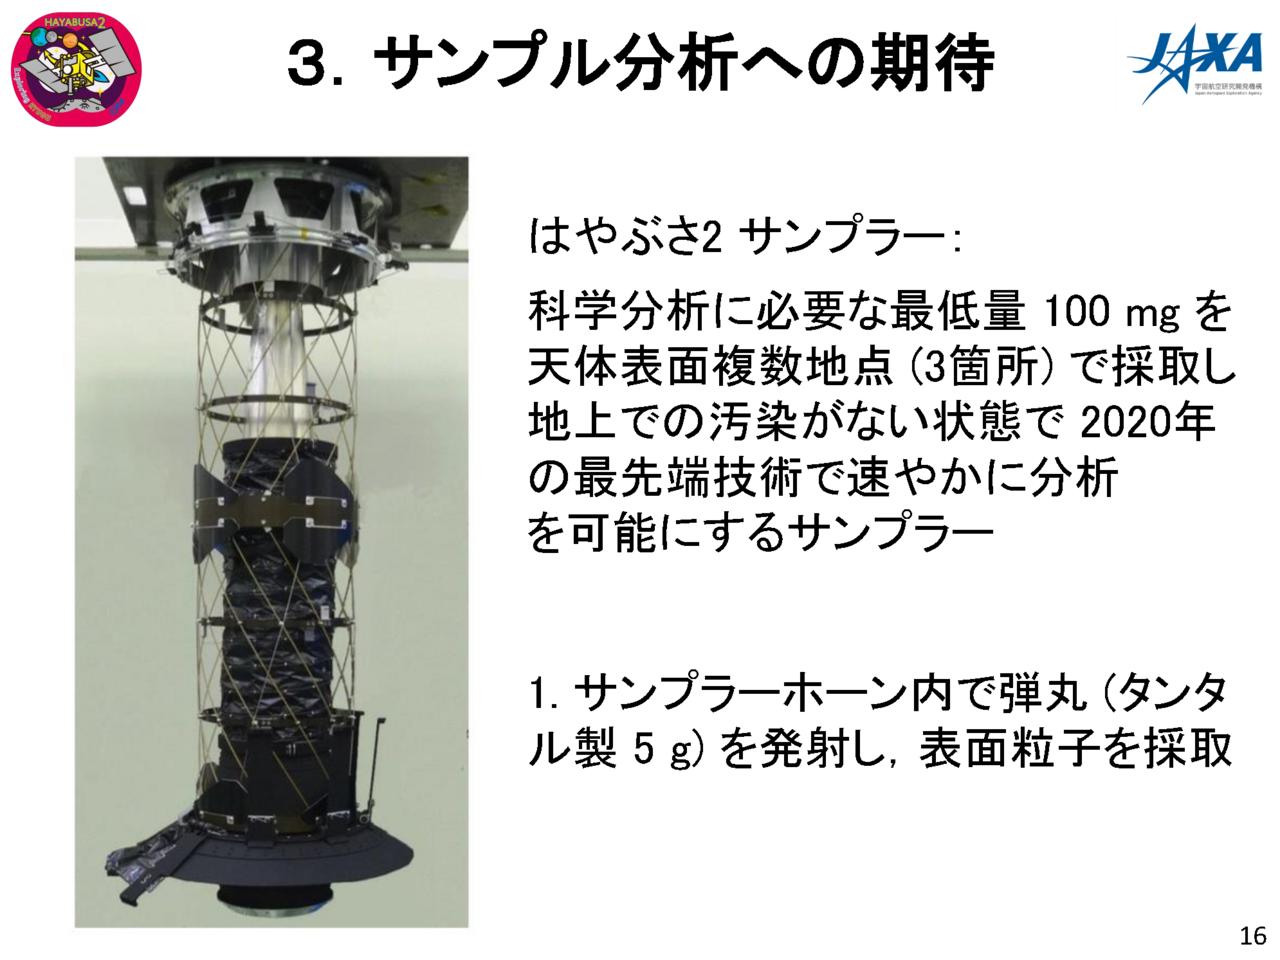 f:id:Imamura:20180719131711p:plain